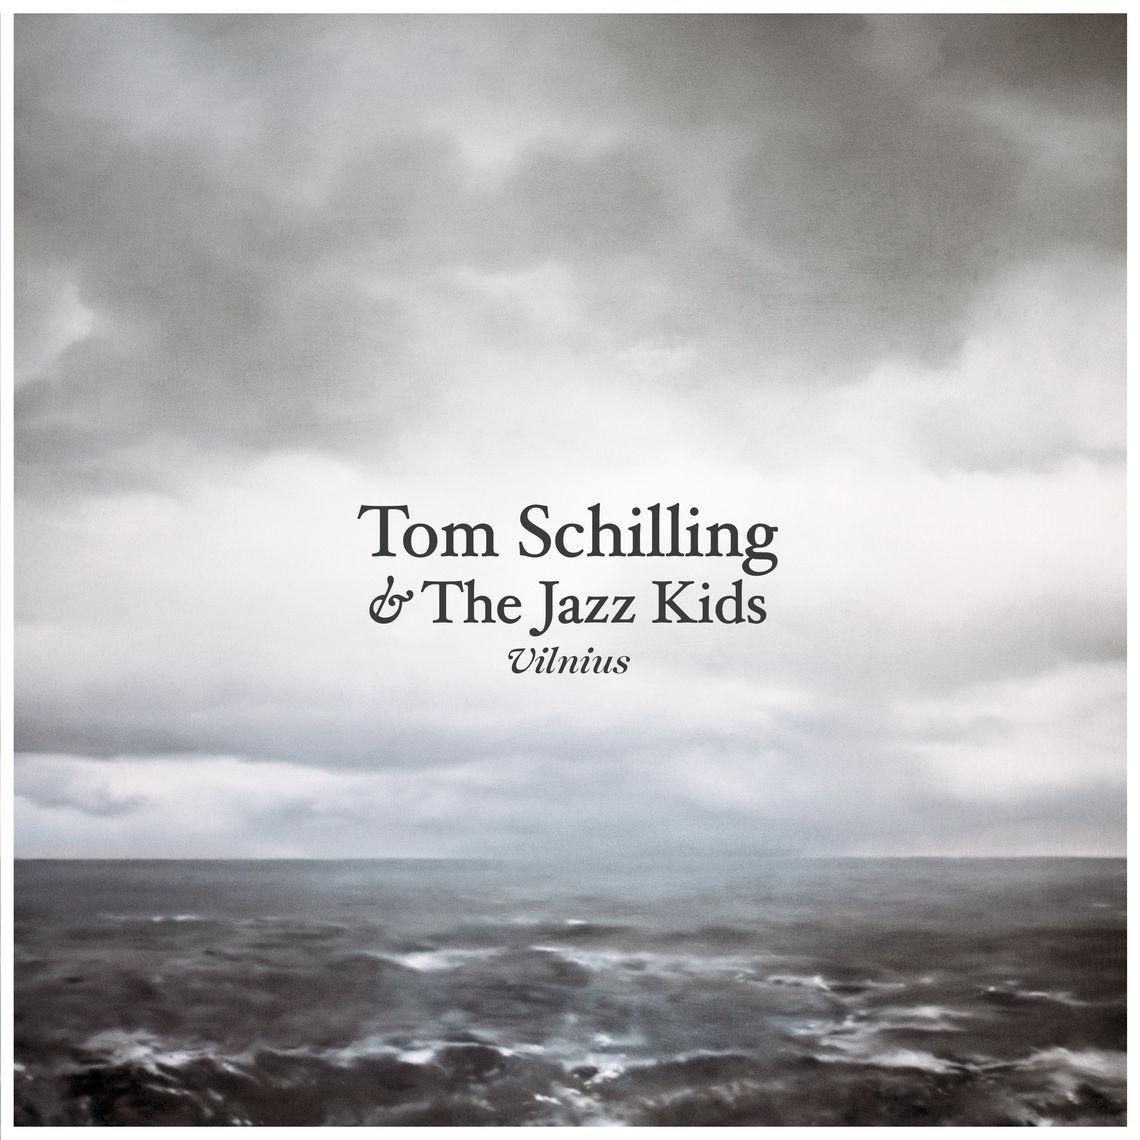 tom schilling cover digital final 01